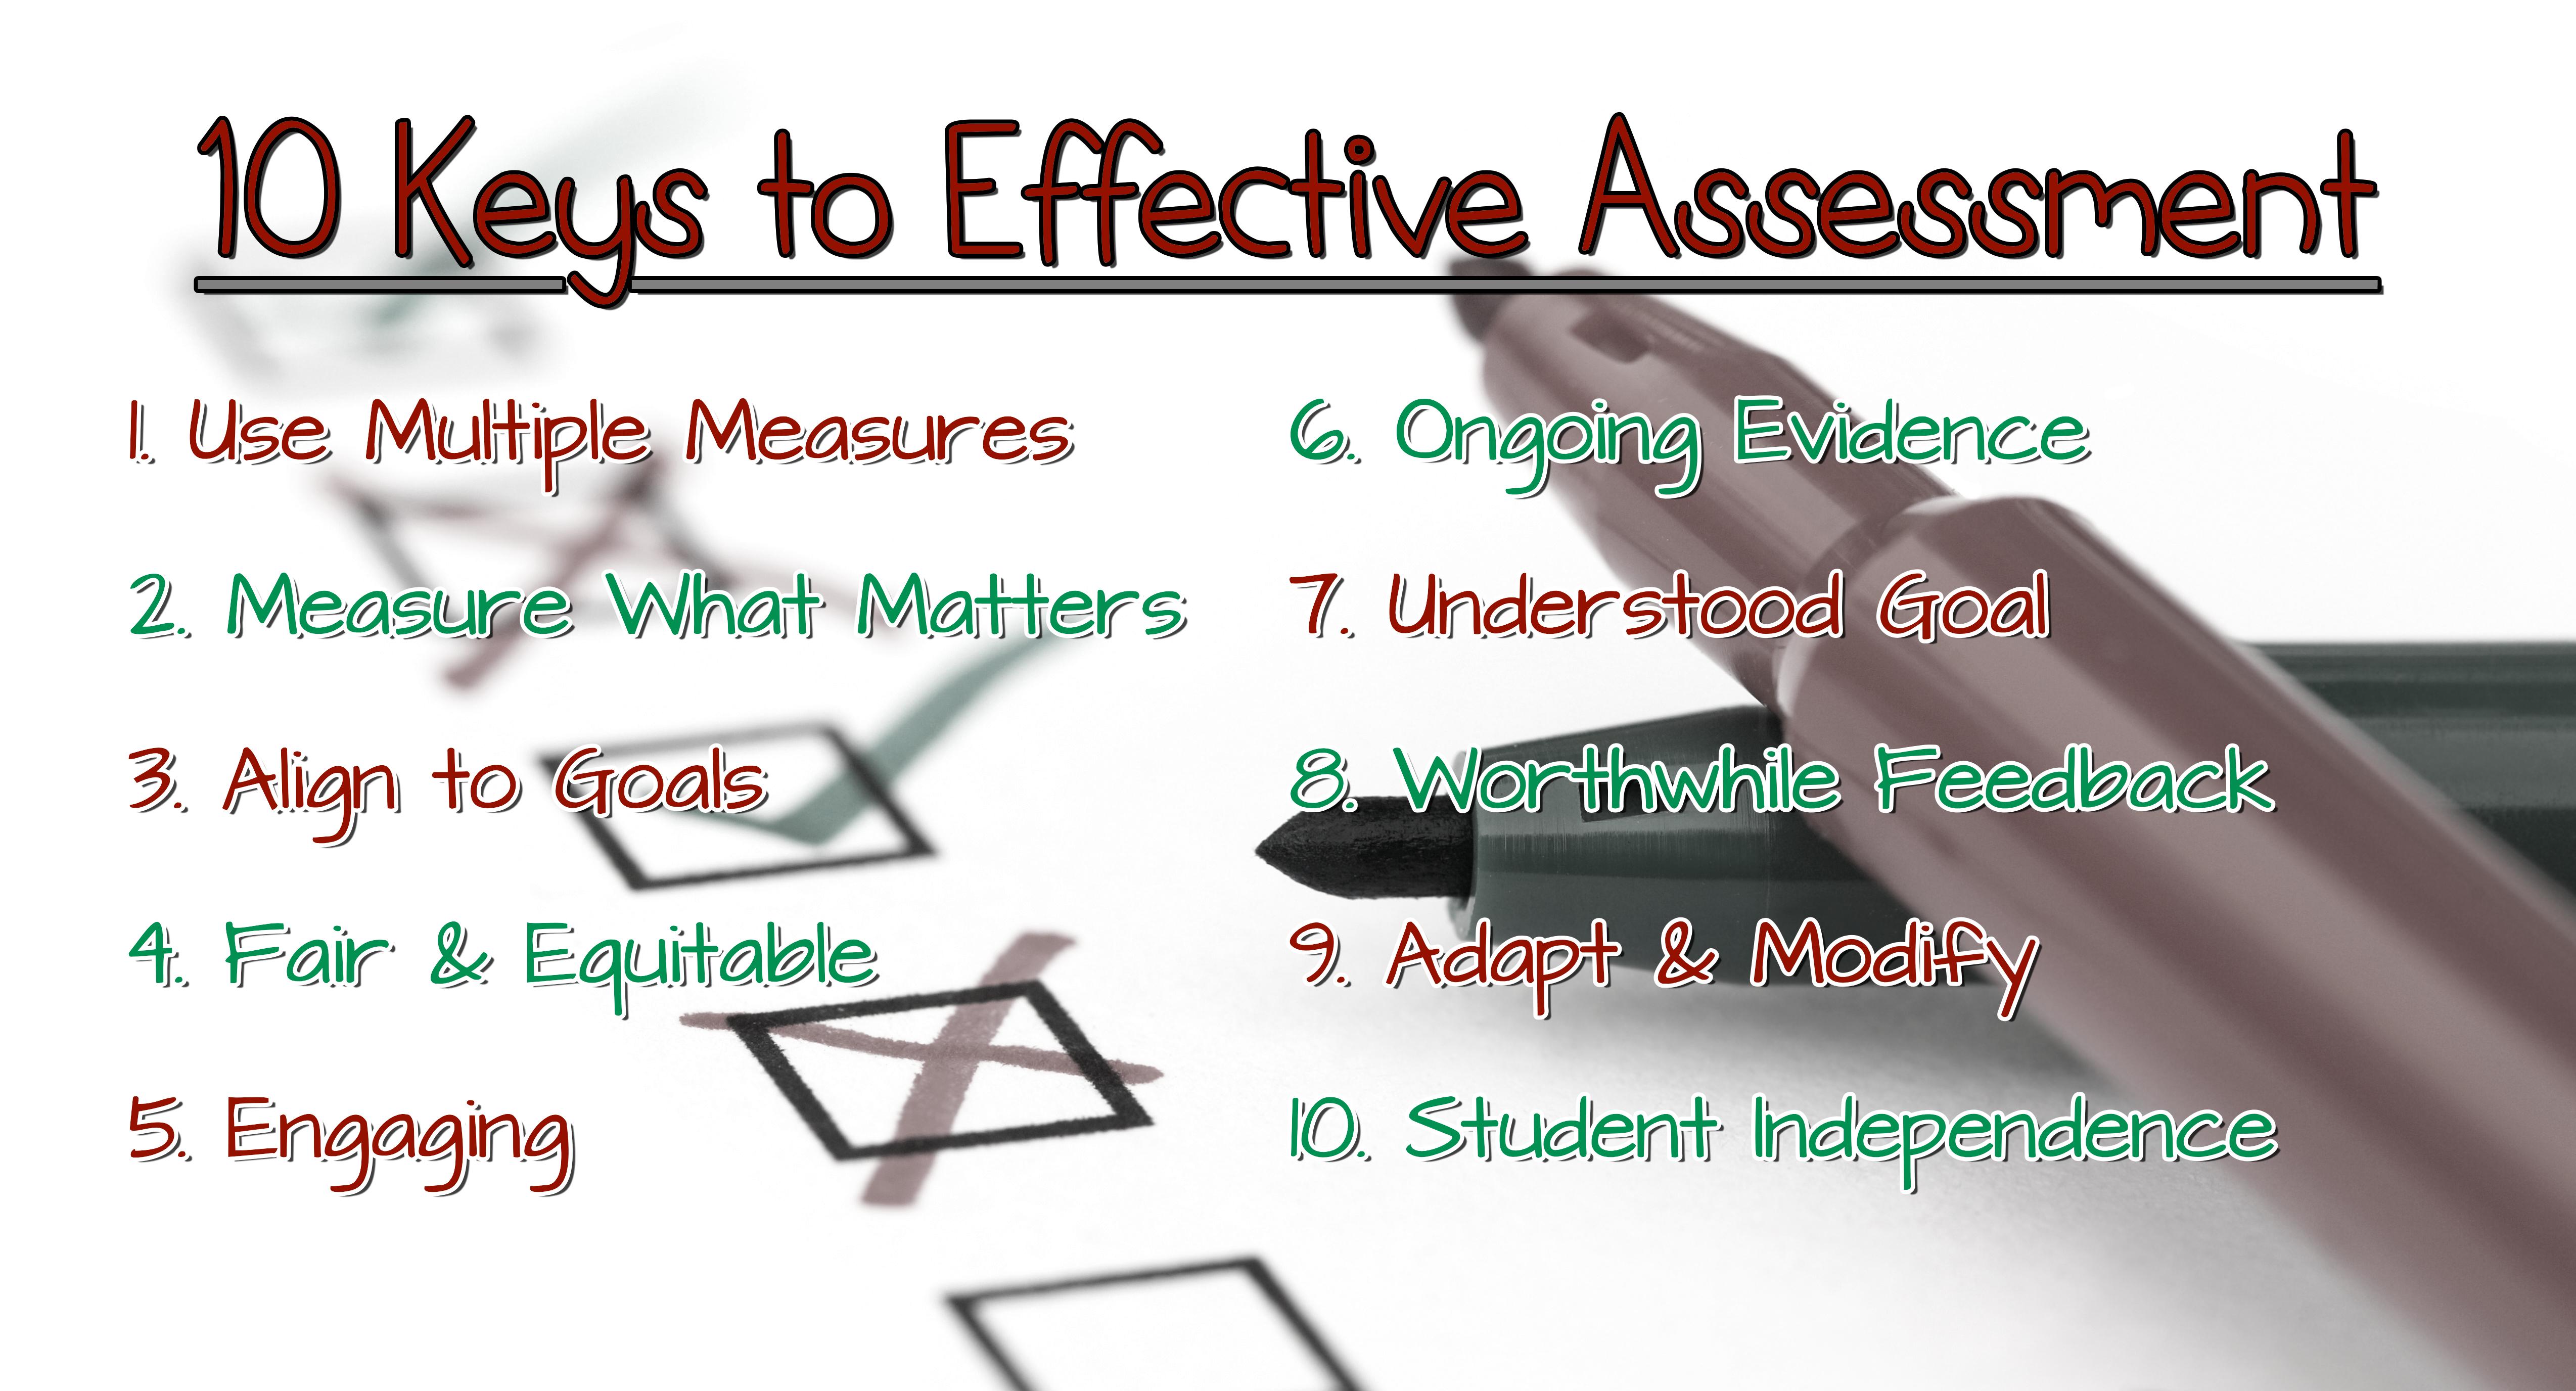 10 Keys to Effective Assessment